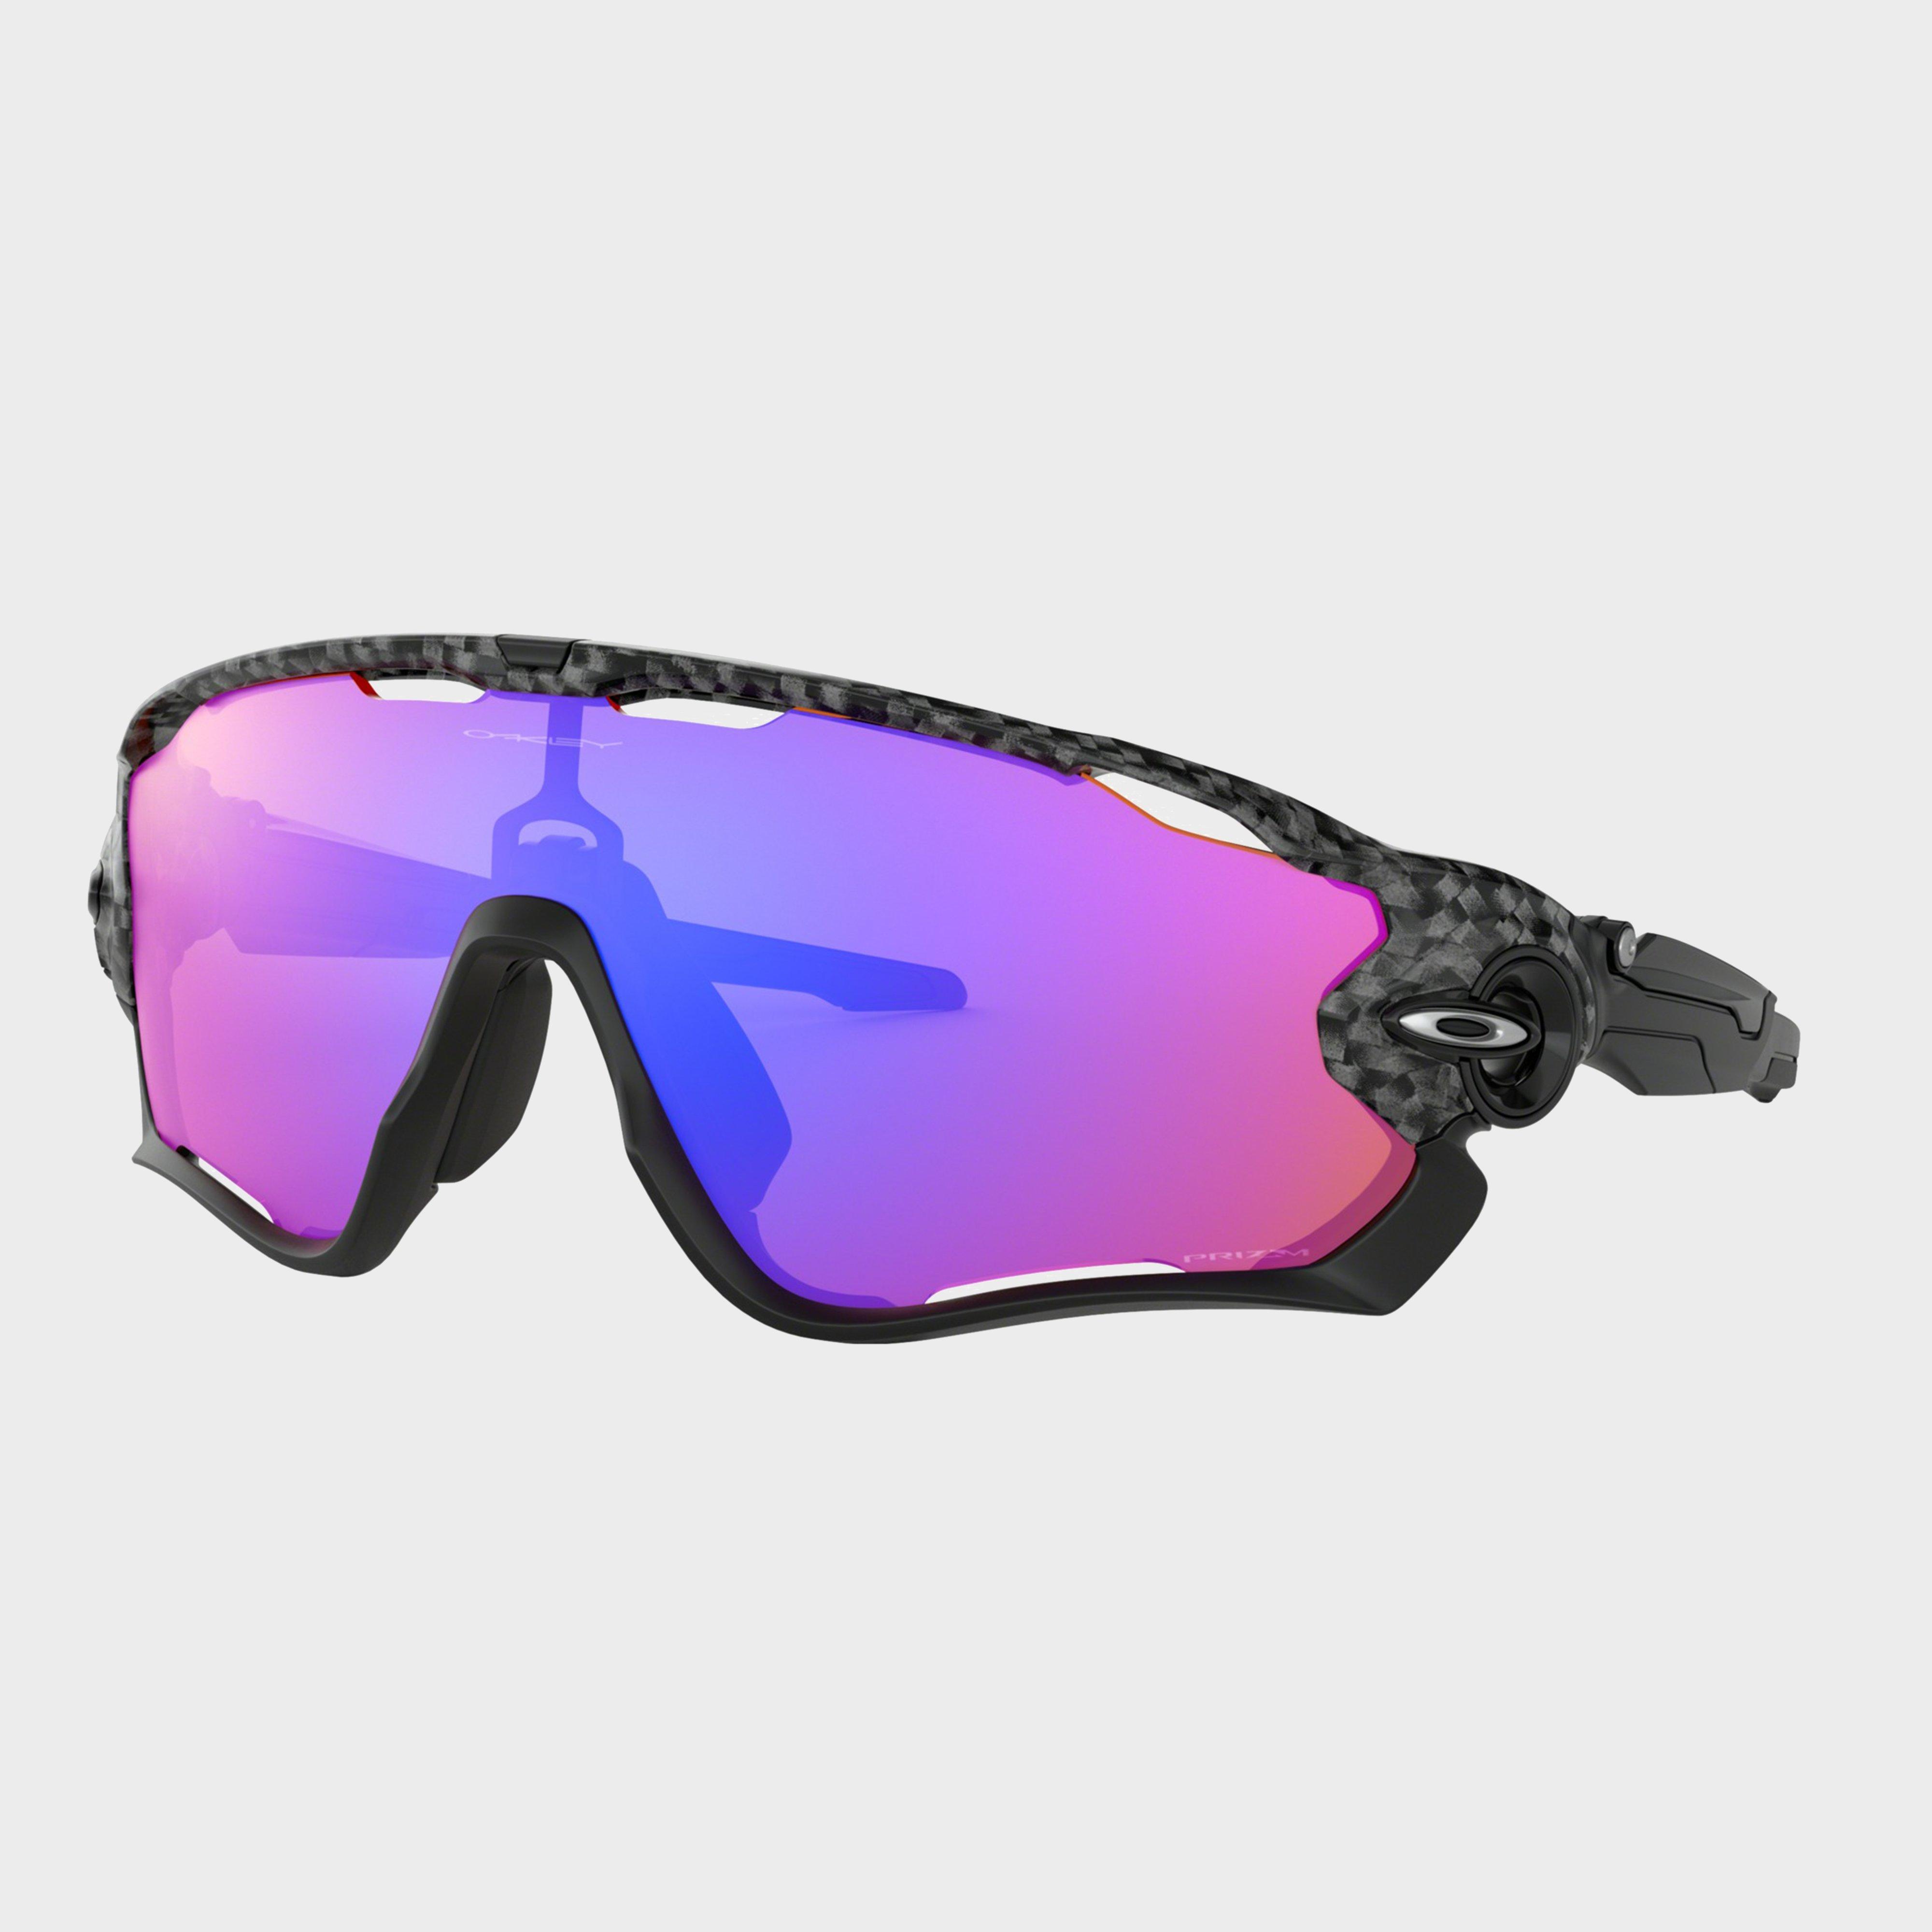 Oakley Jawbreaker Prizm Trail Sunglasses, Black